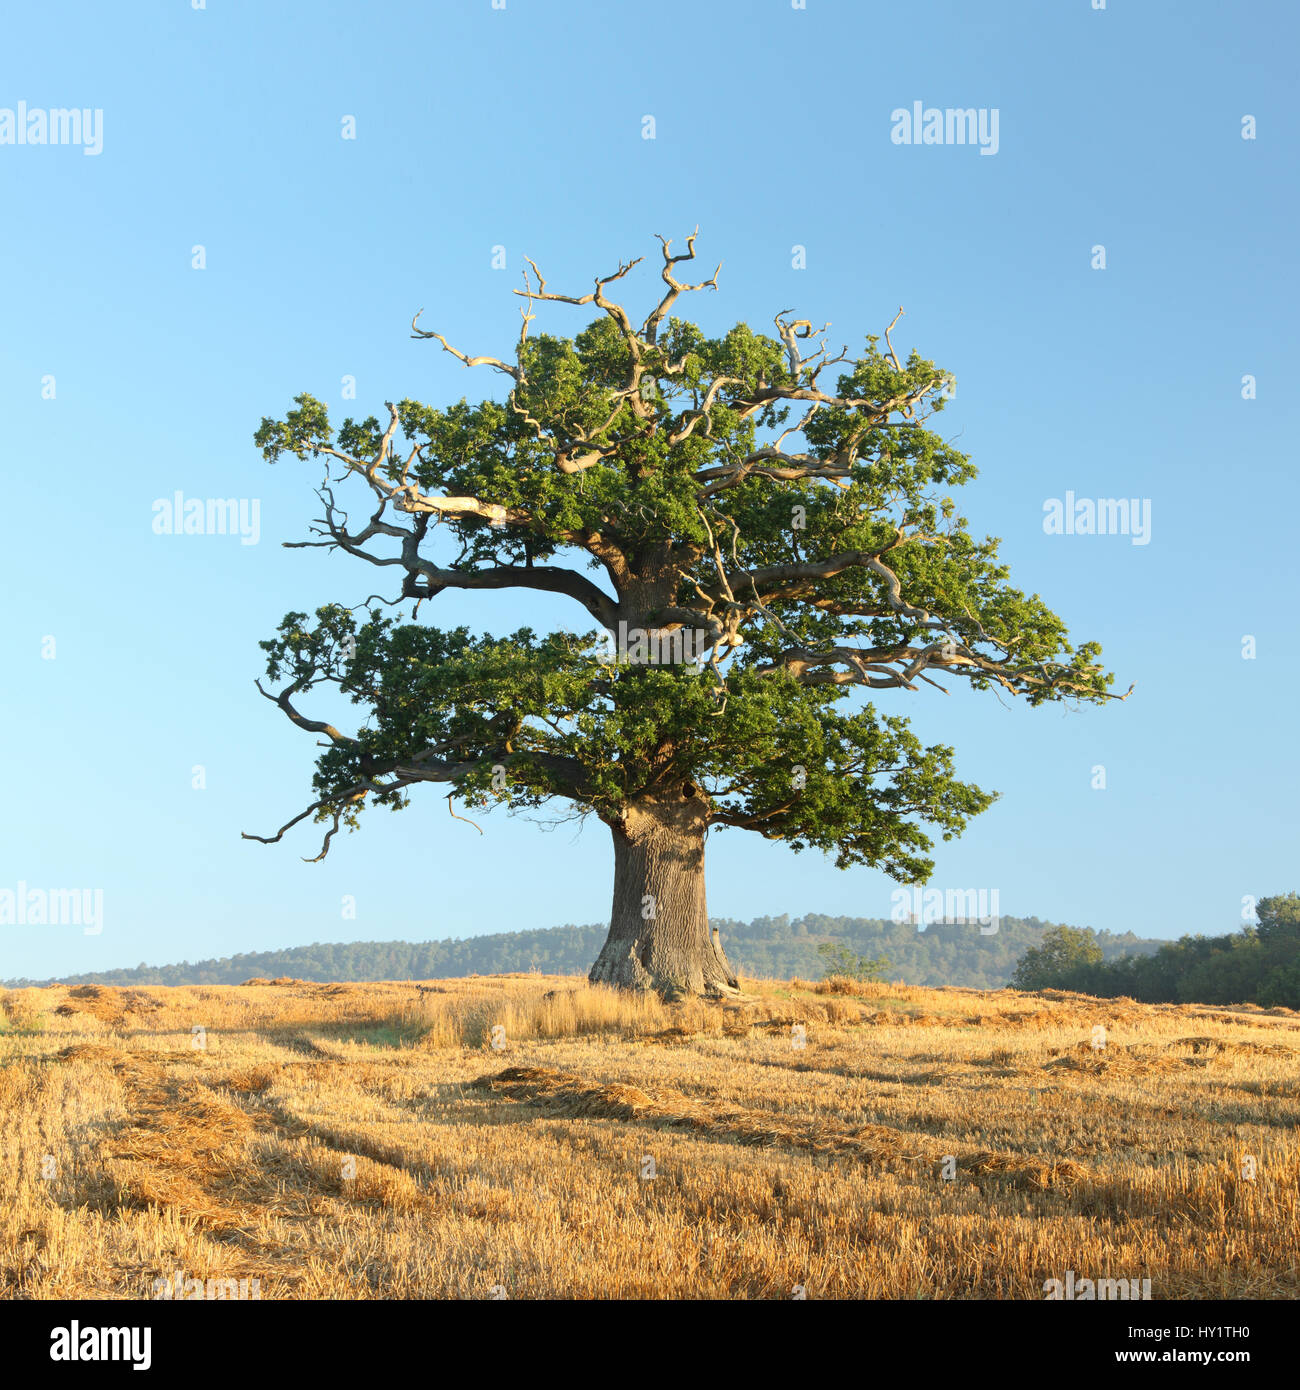 English oak (Quercus robur) tree portrait in autumn, Surrey, UK, September. - Stock Image